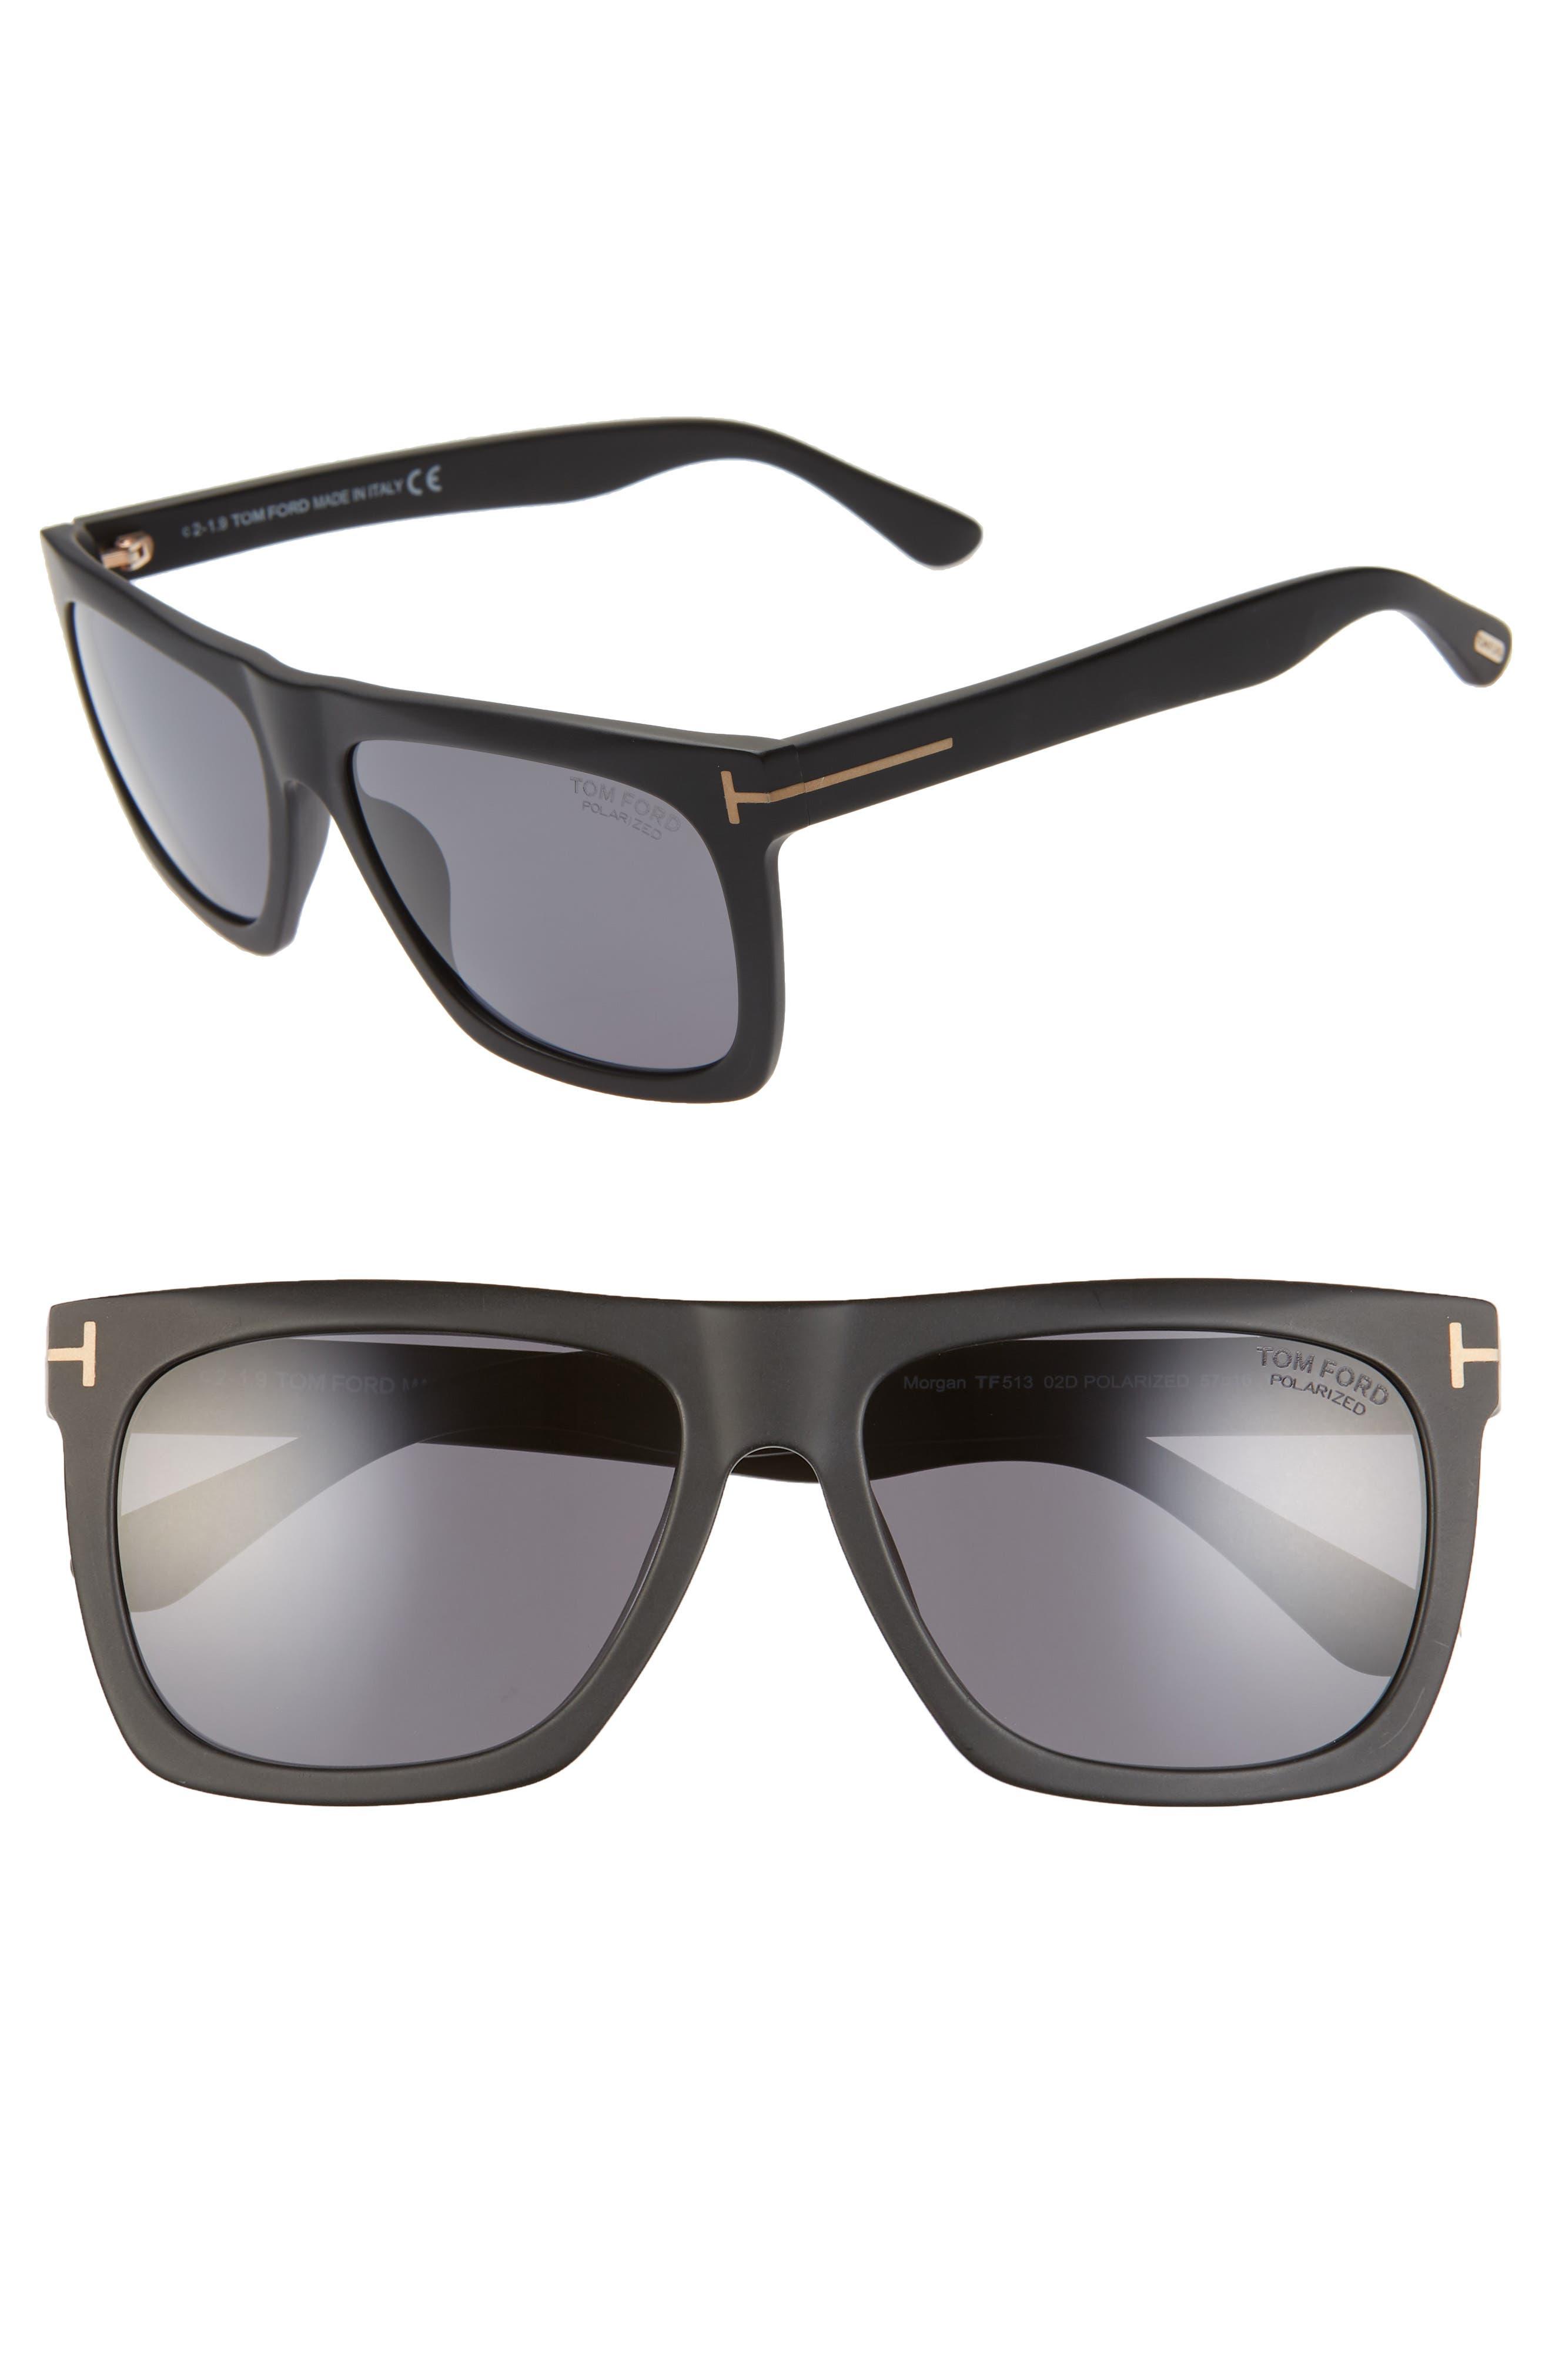 Tom Ford Sunglasses Morgan 57mm Polarized Sunglasses